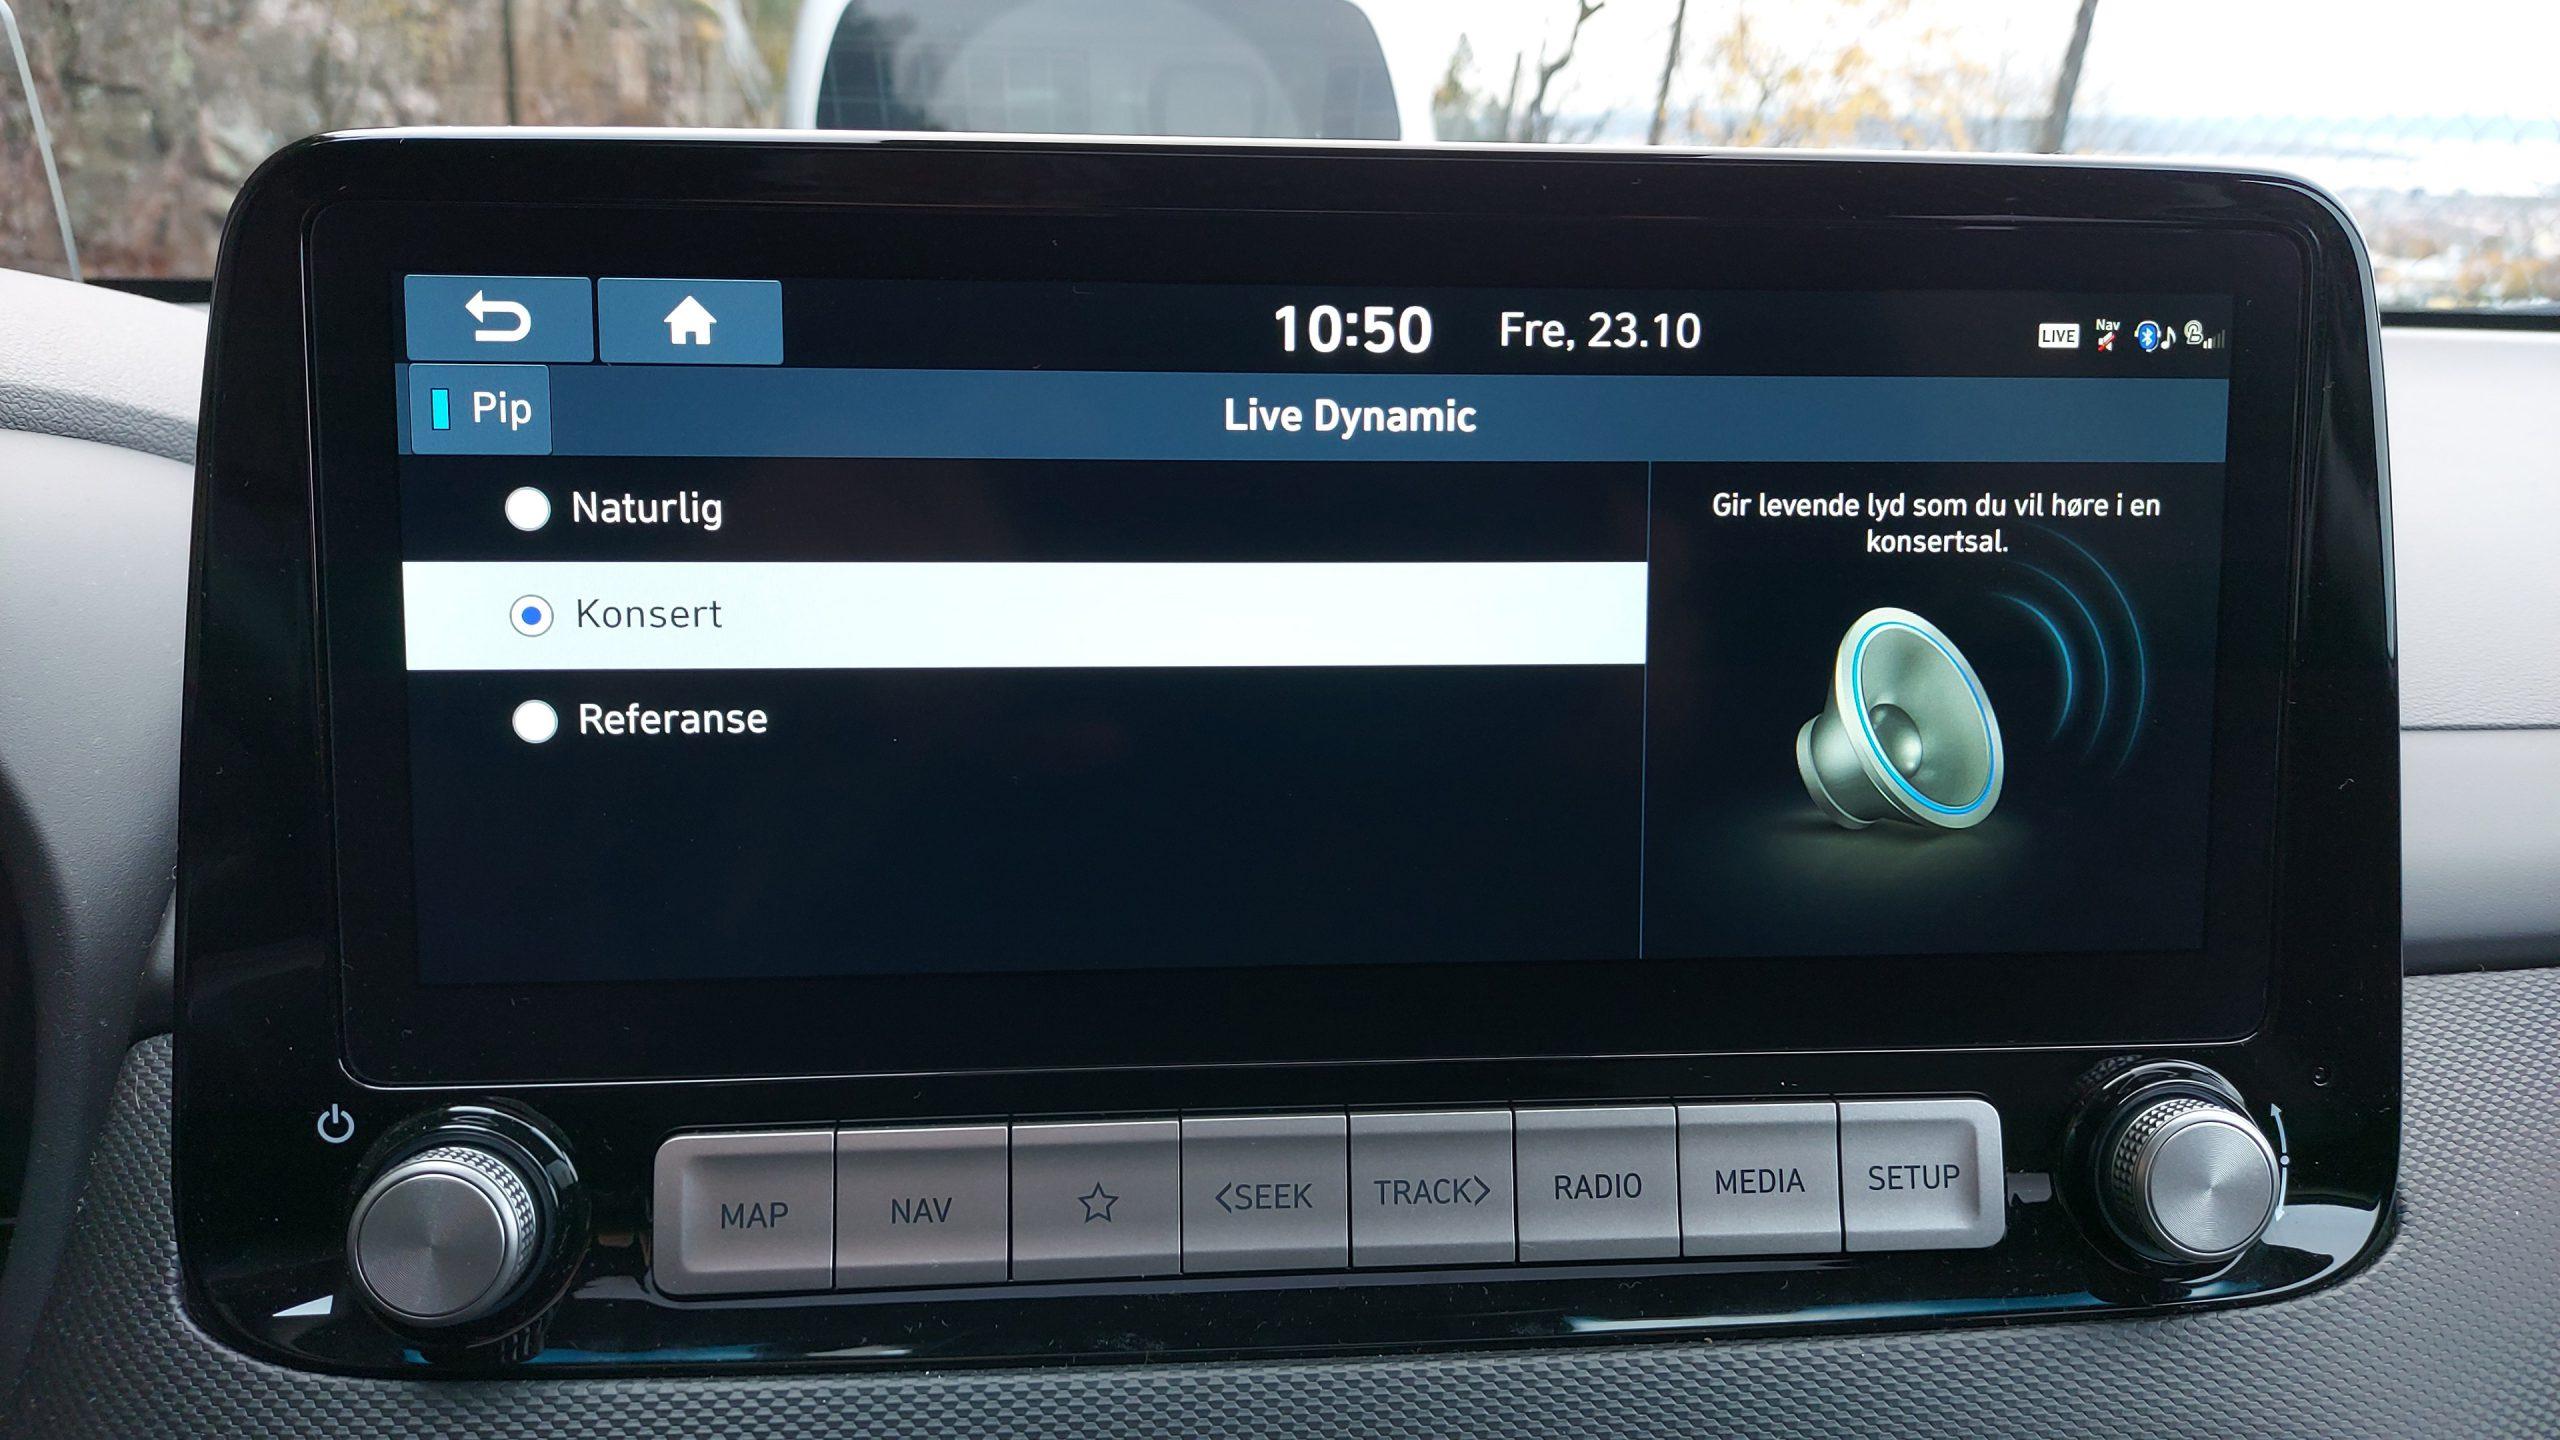 Hyundai Kona sound settings